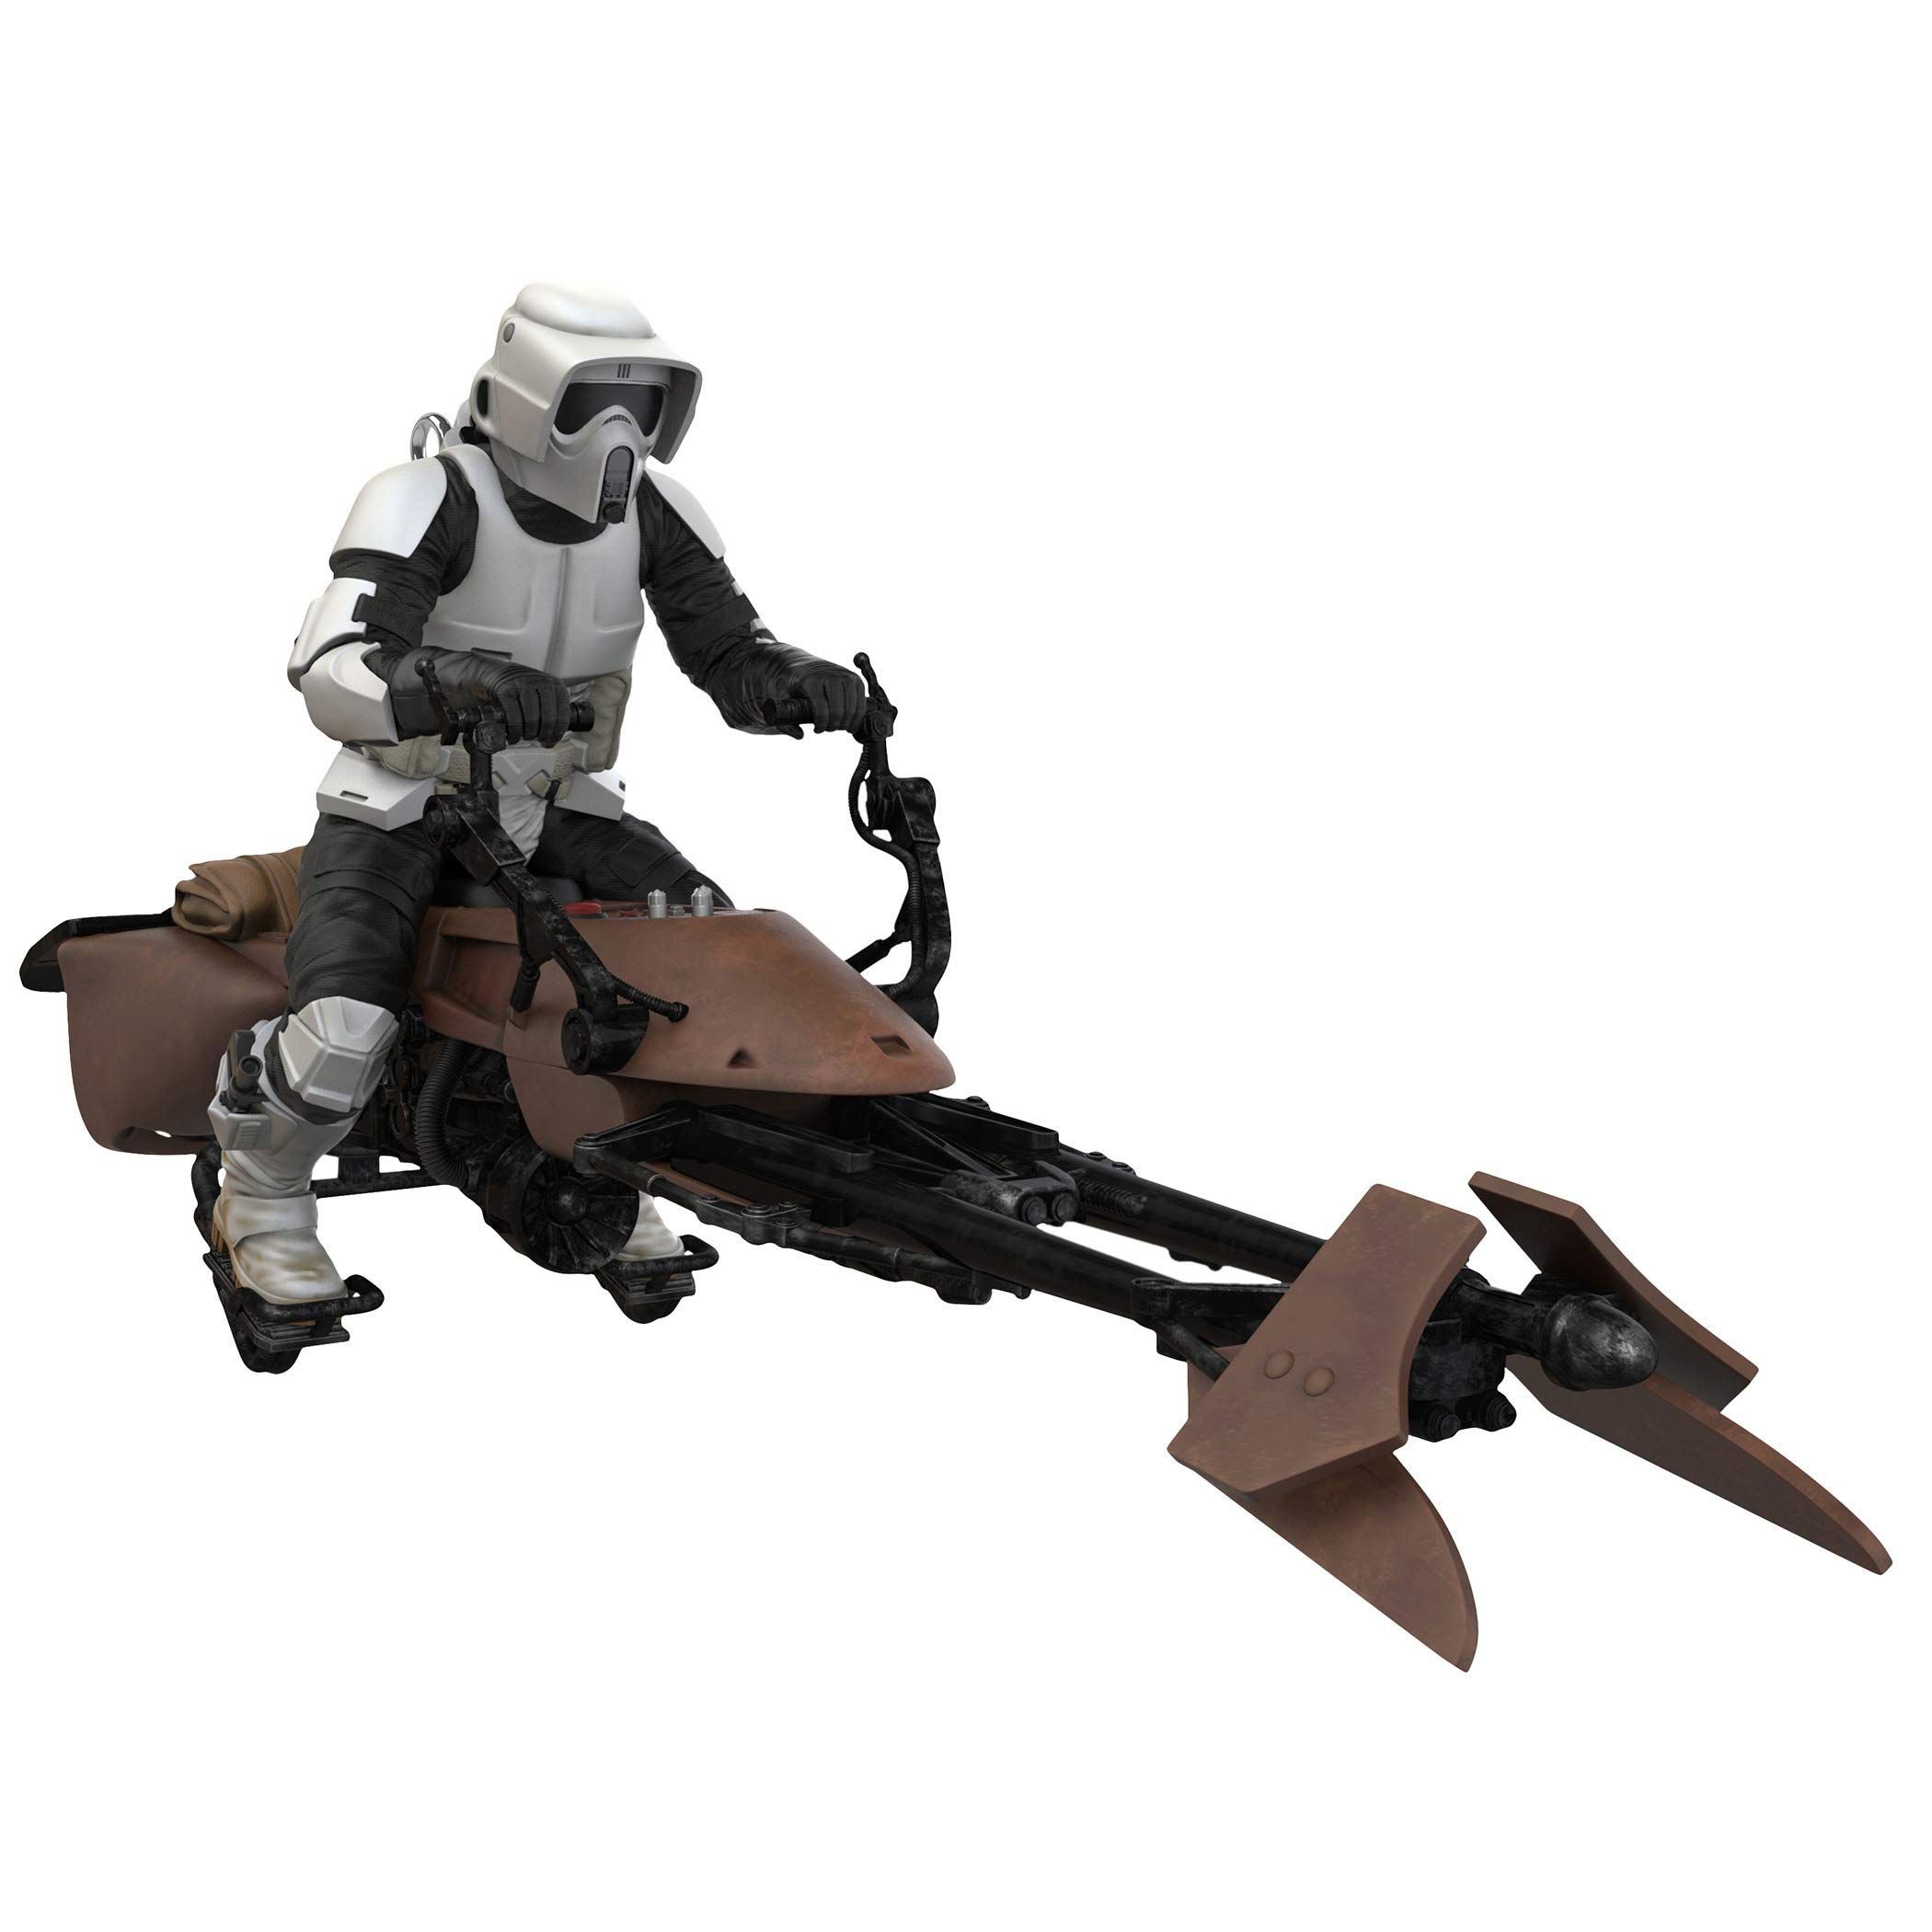 Hallmark Keepsake Christmas Ornament 2019 Year Dated Star Wars: Return of The Jedi A Wild Ride on Endor with Sound